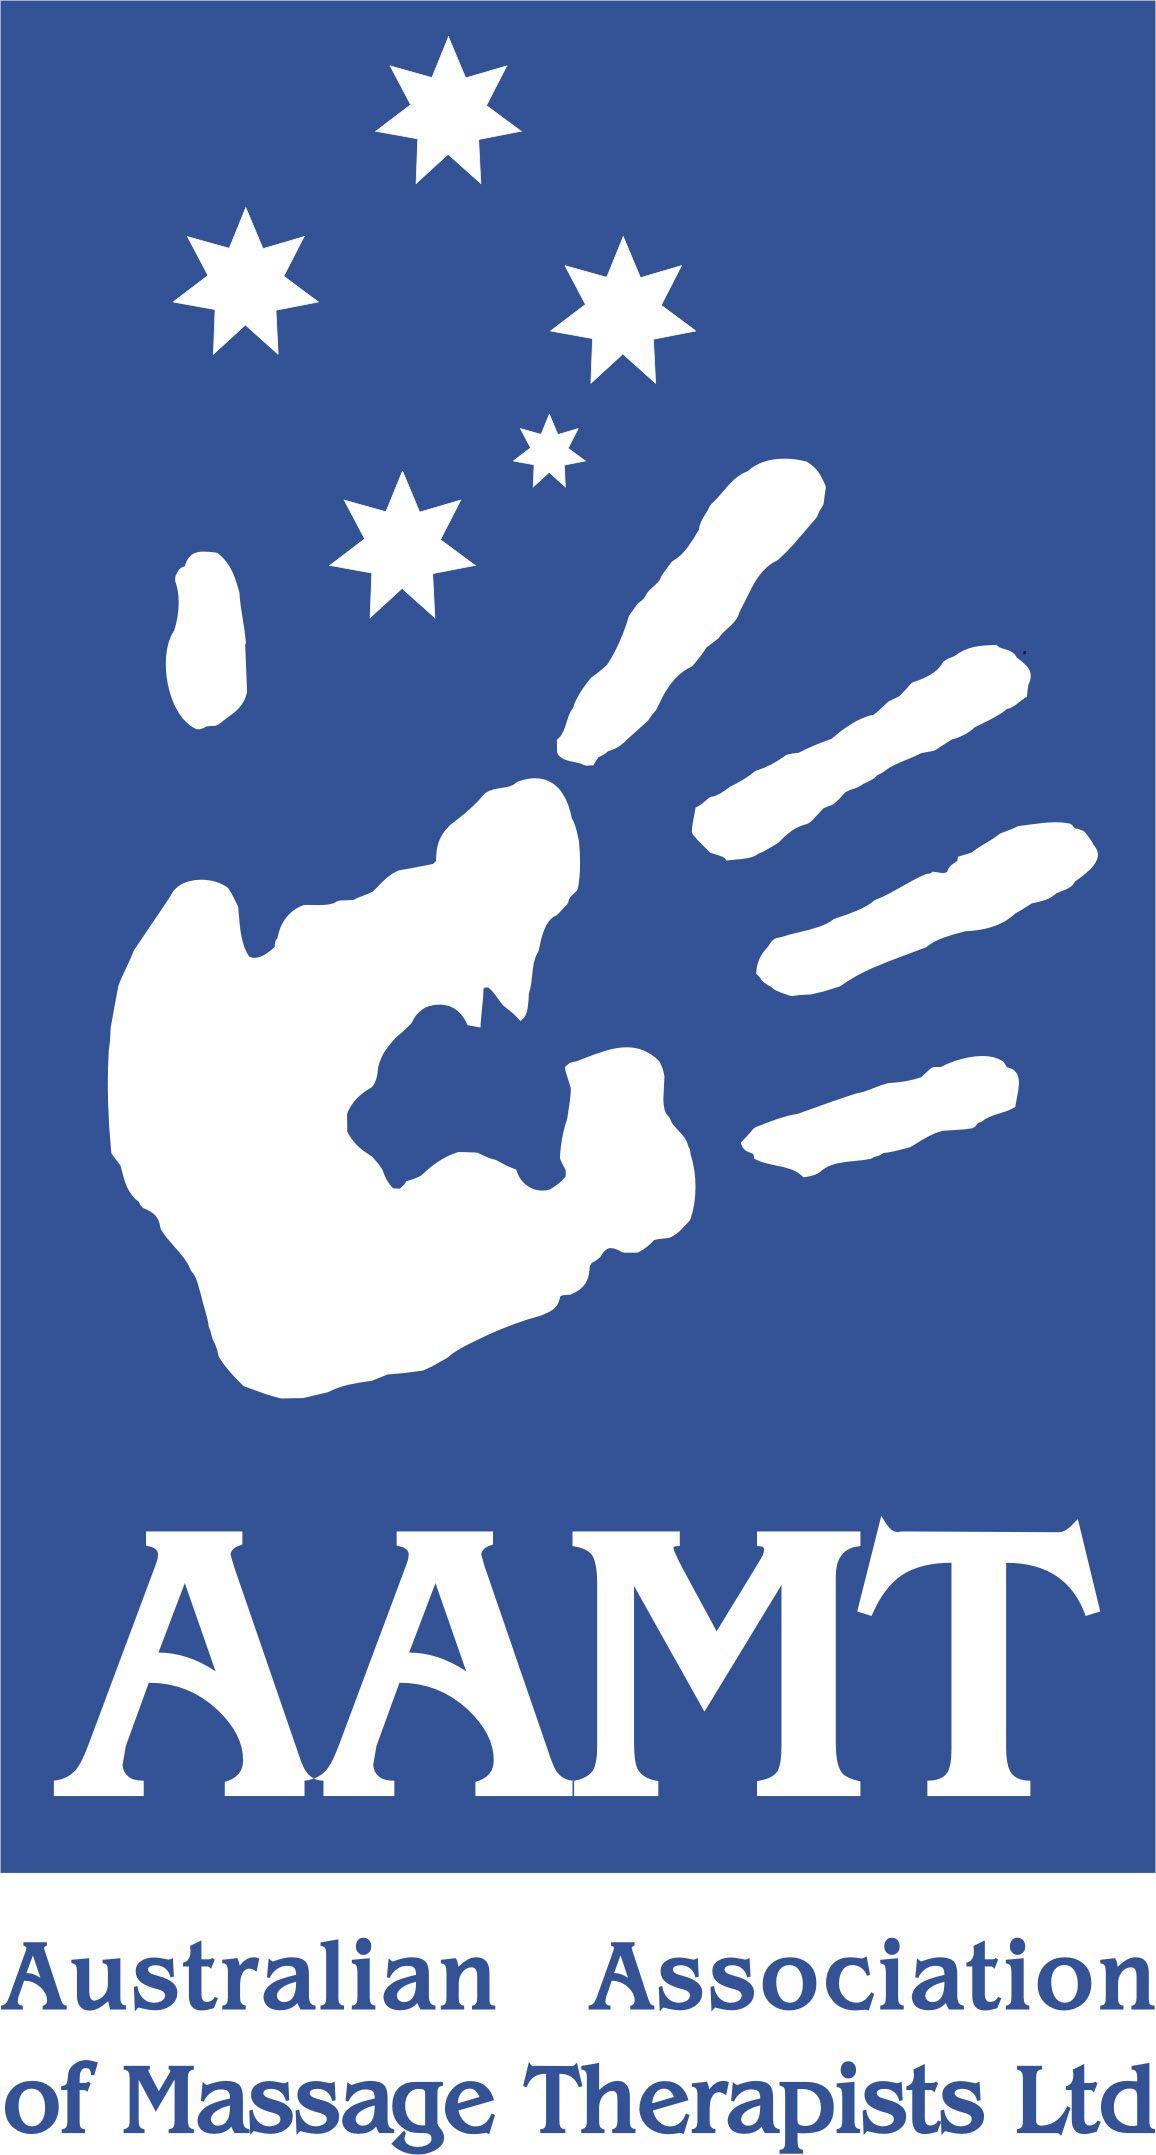 Australian Association of Massage Therapists Limited